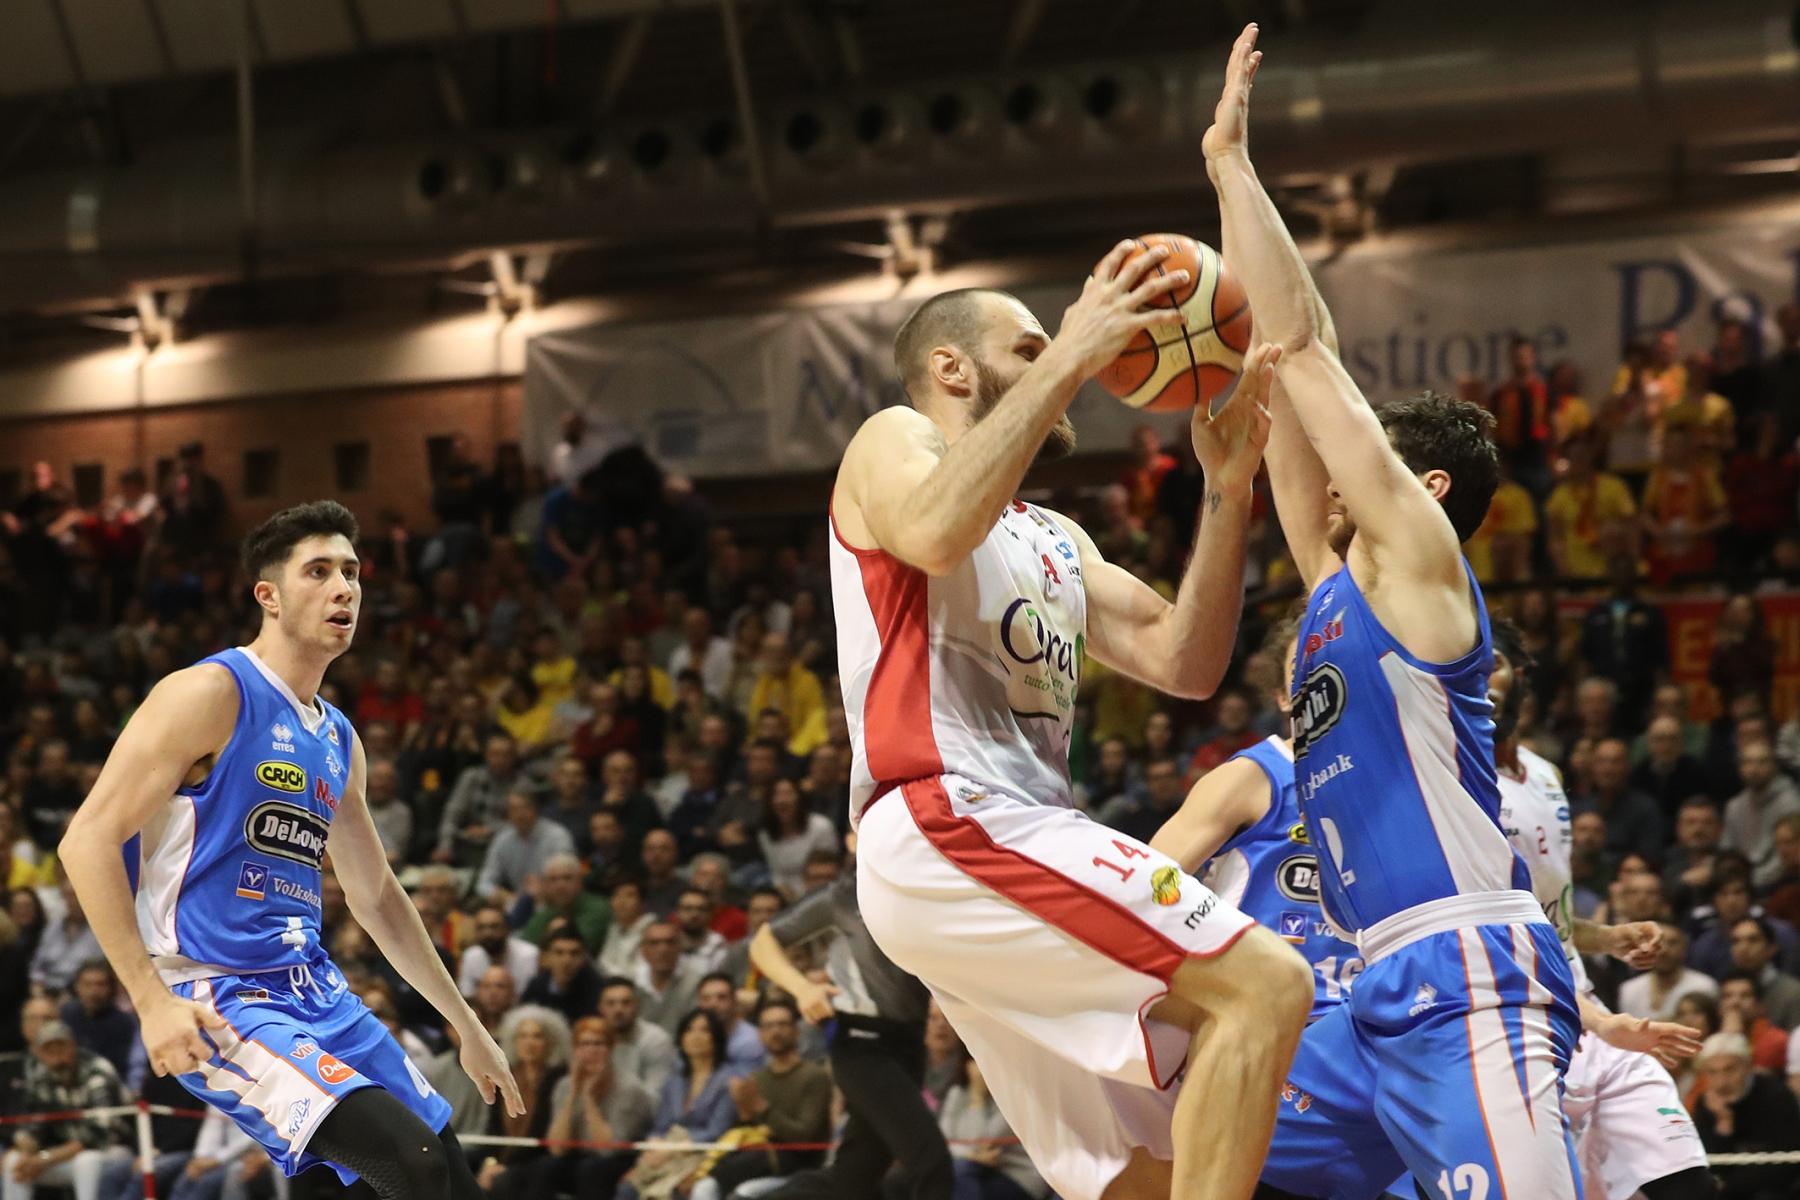 LNP serie A2 Ventottesima giornata. OraSì Basket Ravenna - De longhi Treviso.